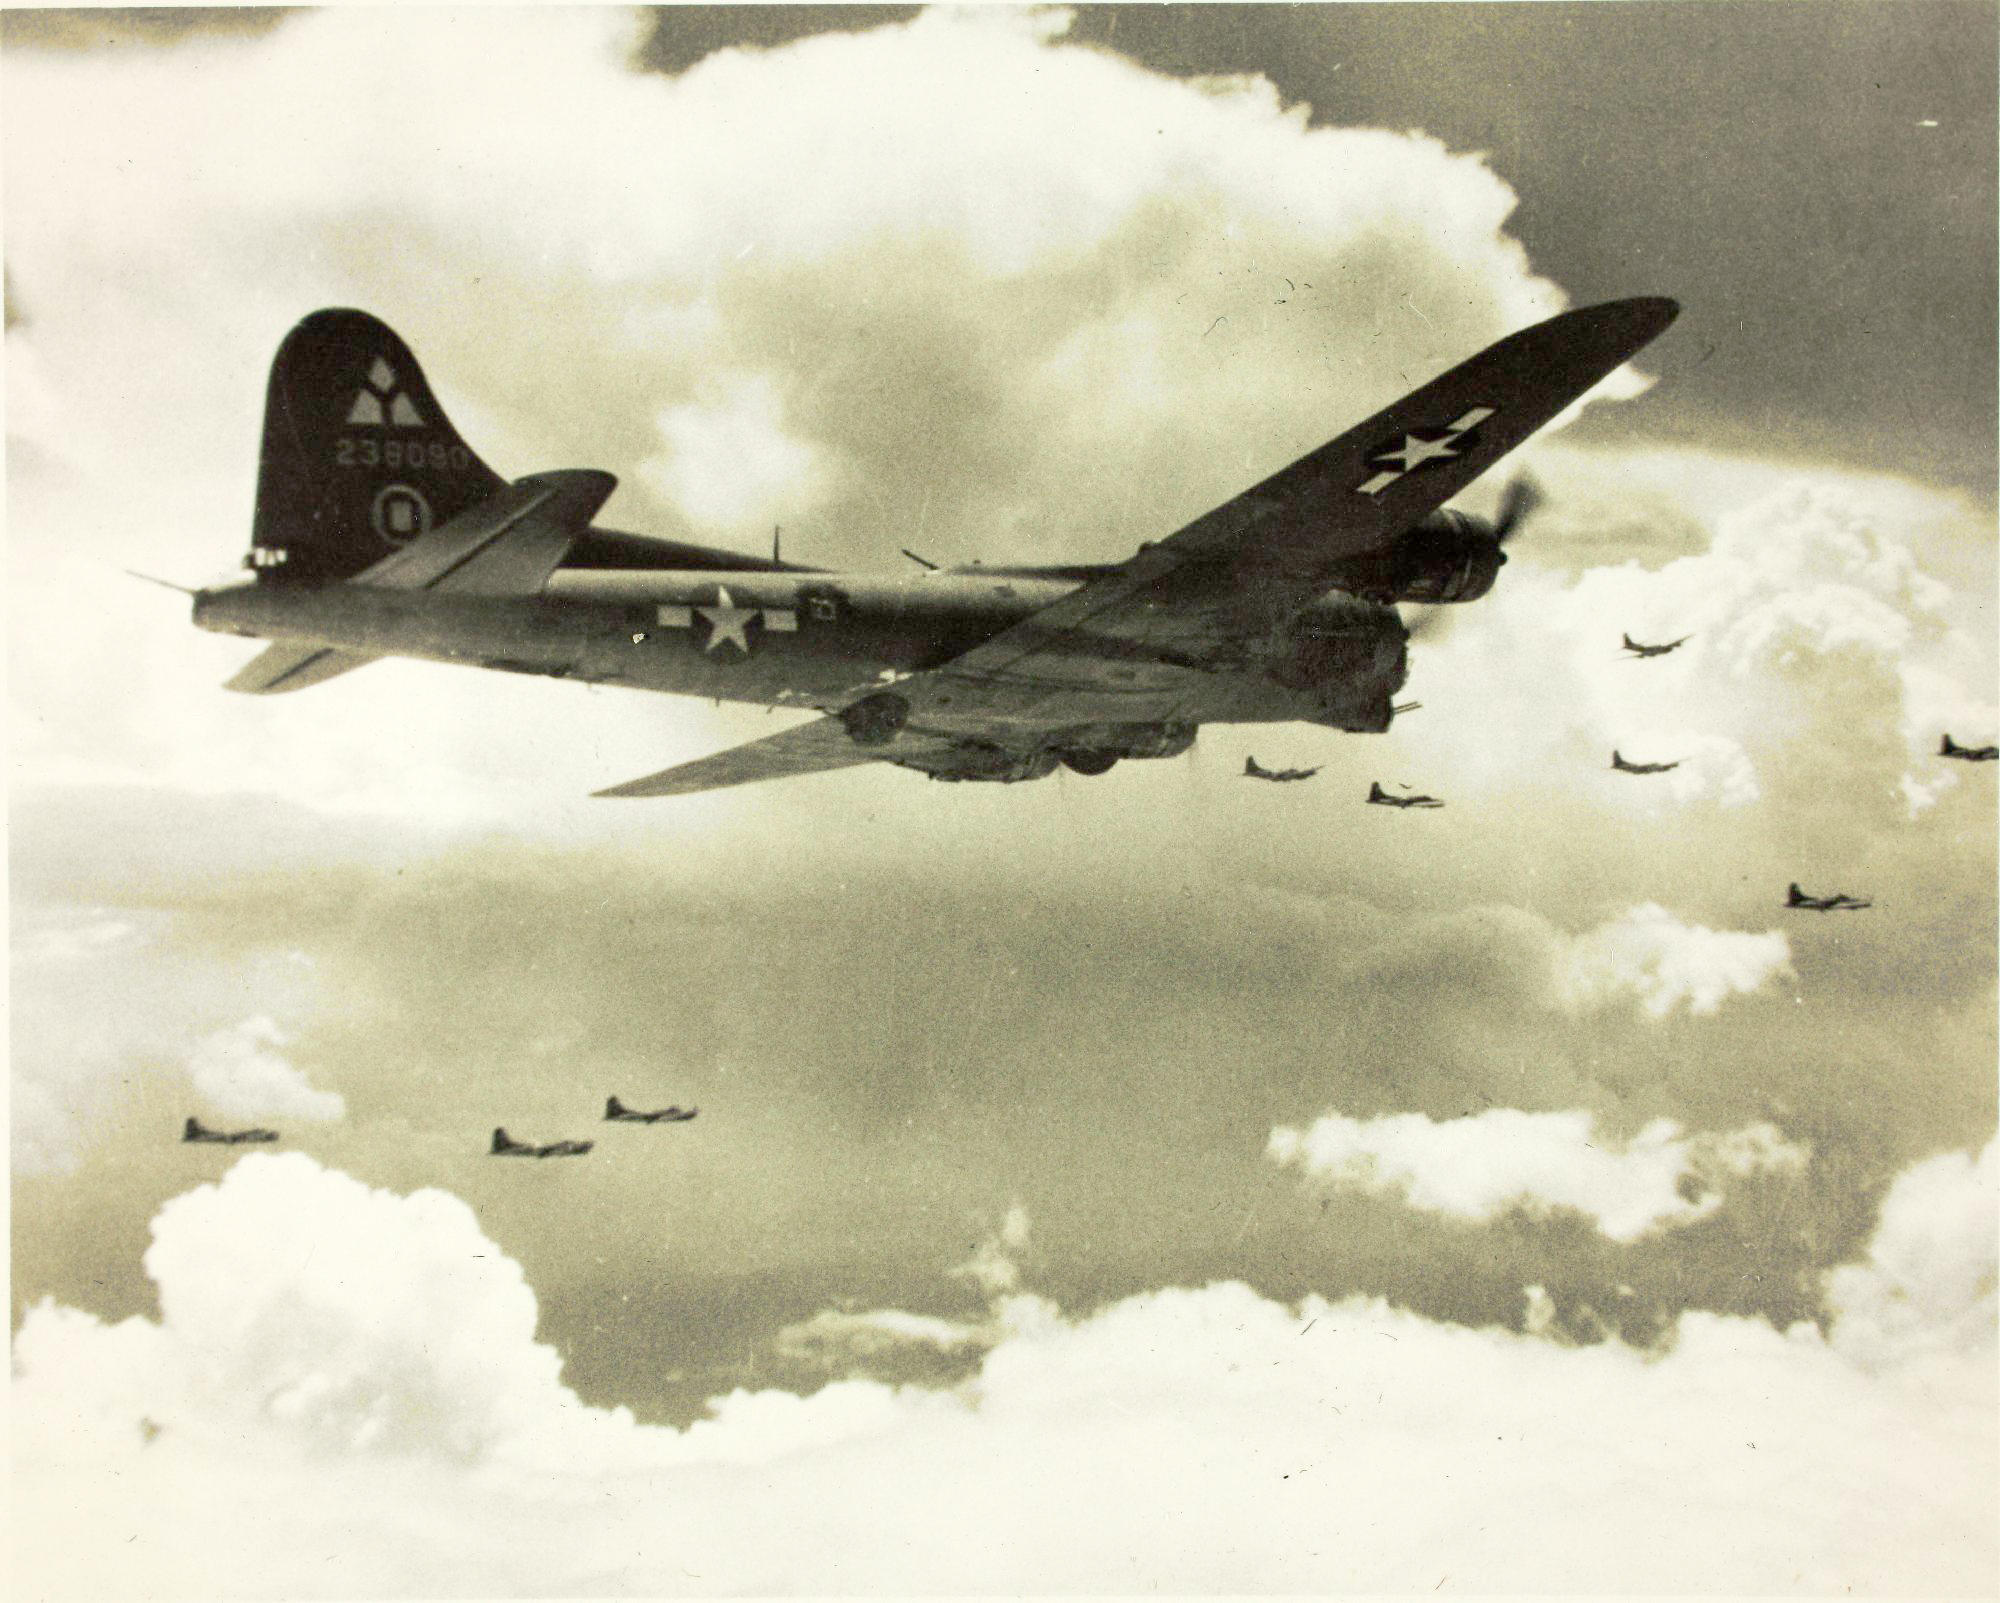 B-17 #42-38090 / Miss Windy City